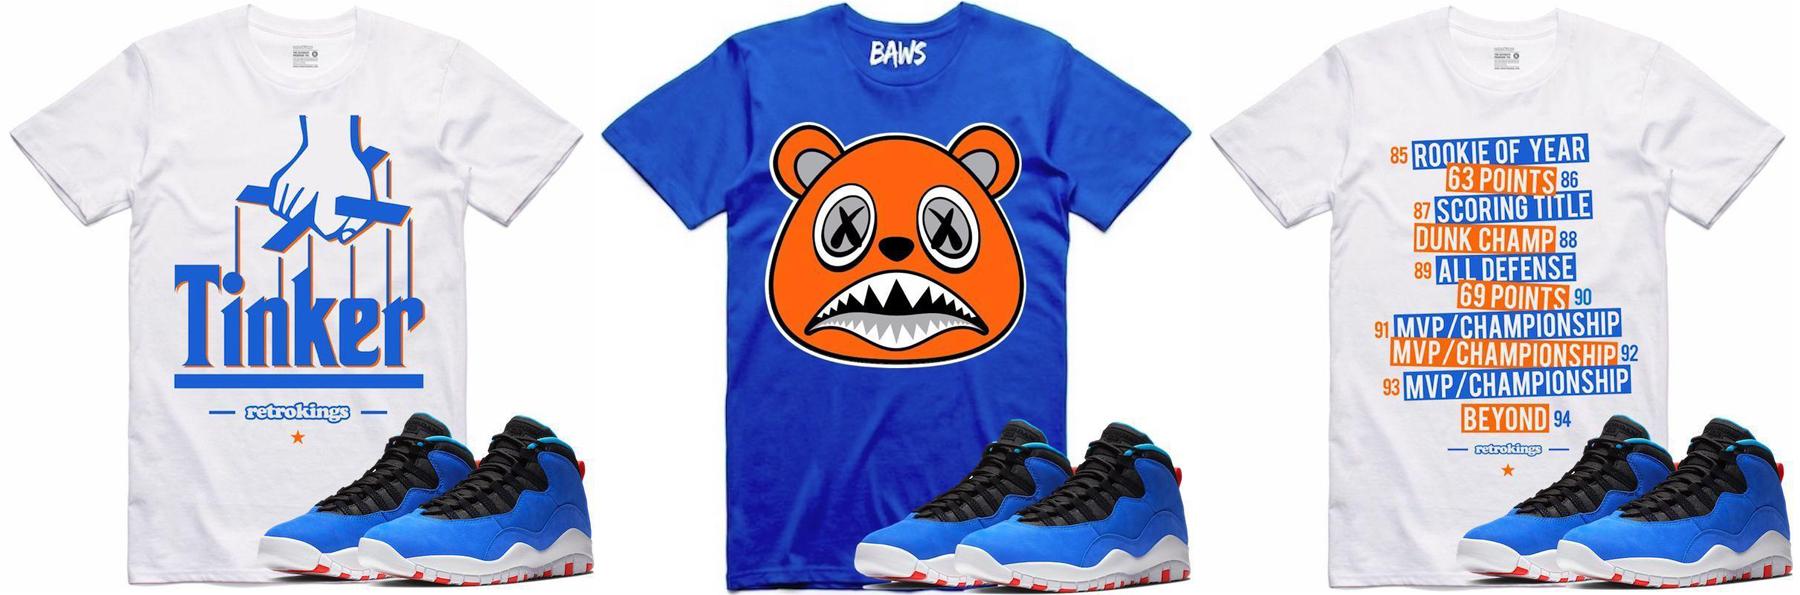 ad31ff10537 Jordan 10 Tinker Huarache Sneakers Shirts | SneakerFits.com